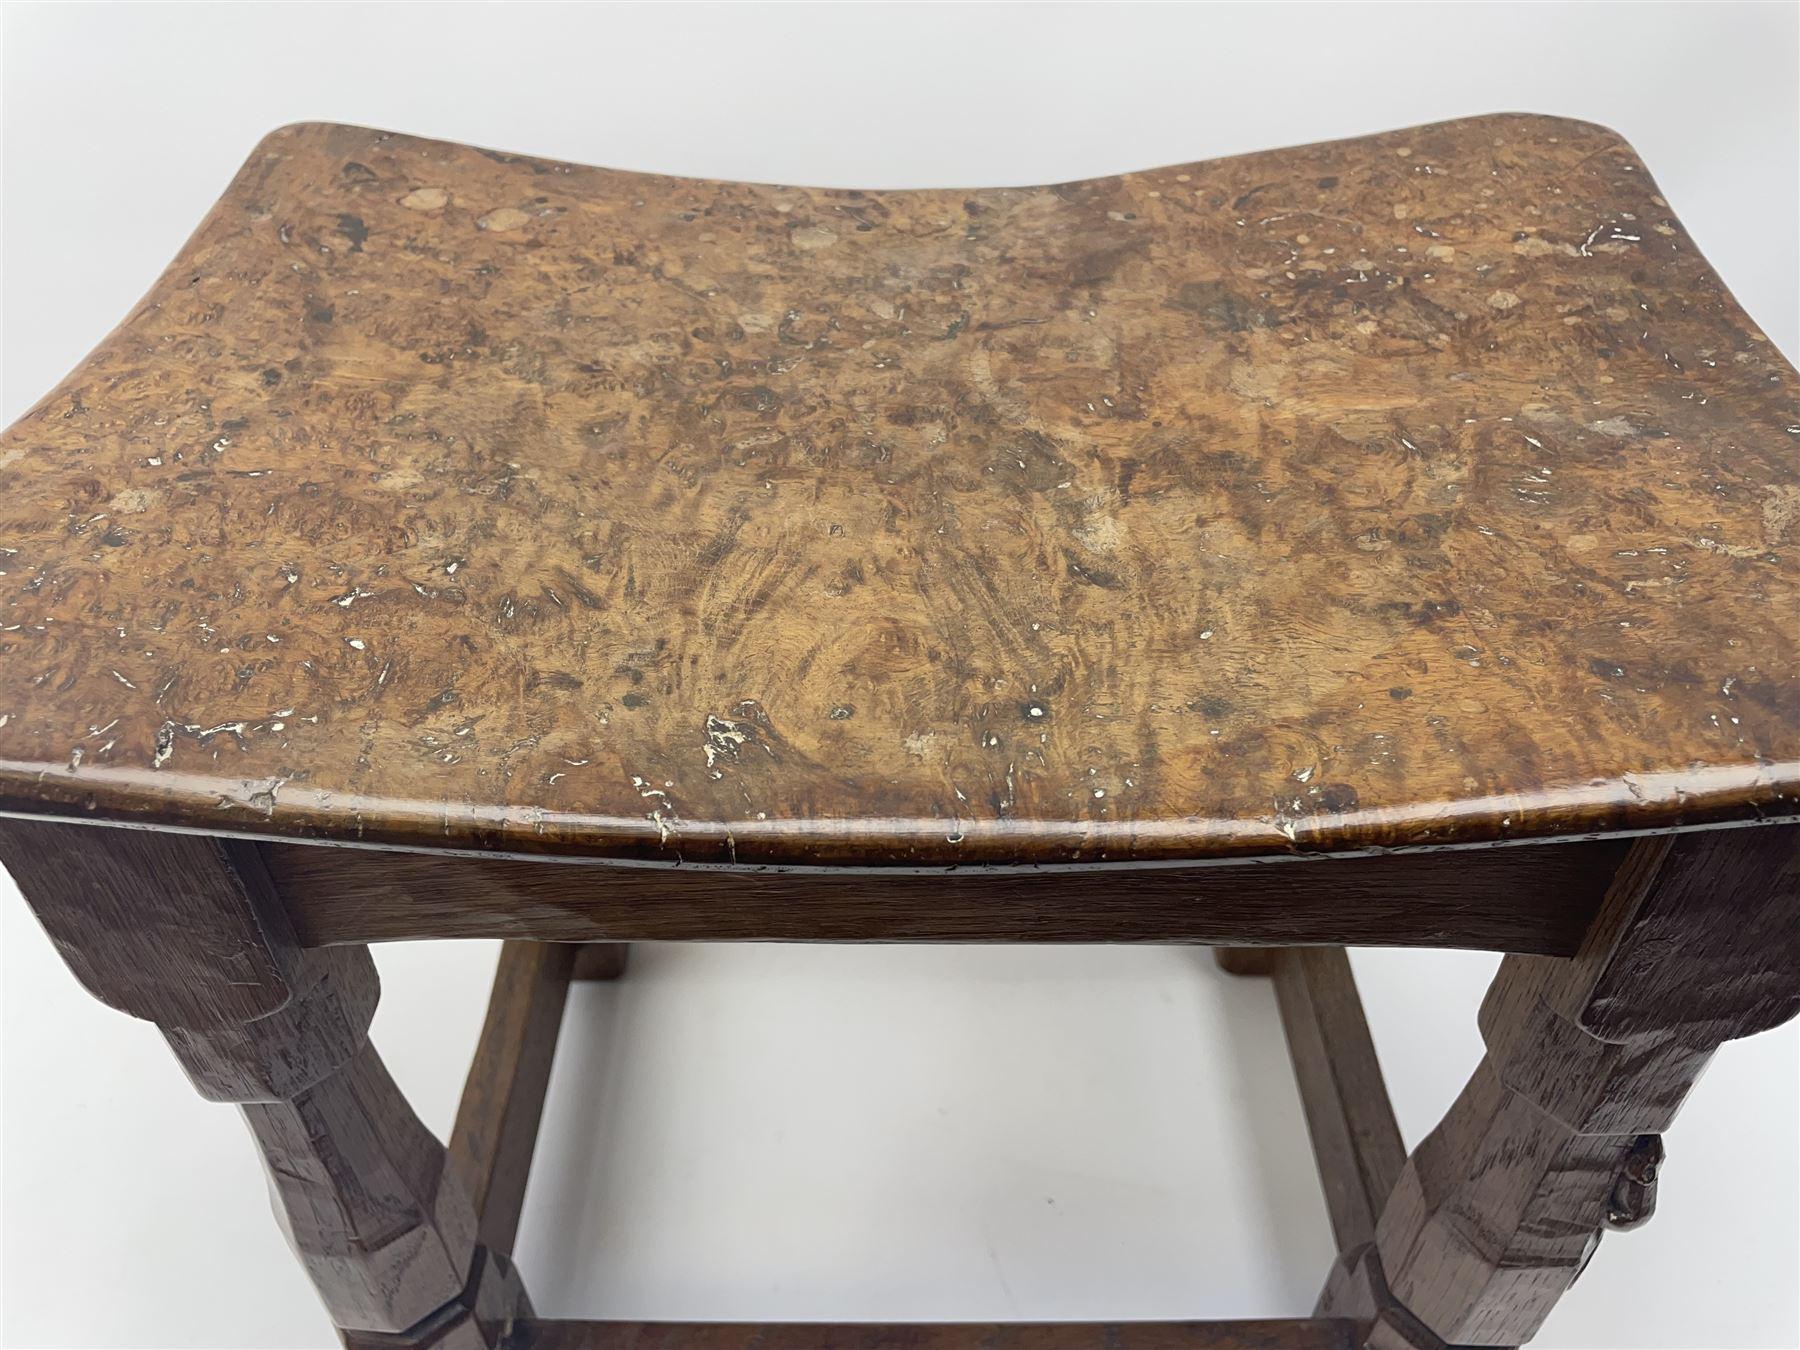 'Mouseman' 1940s adzed oak joint stool - Image 5 of 7